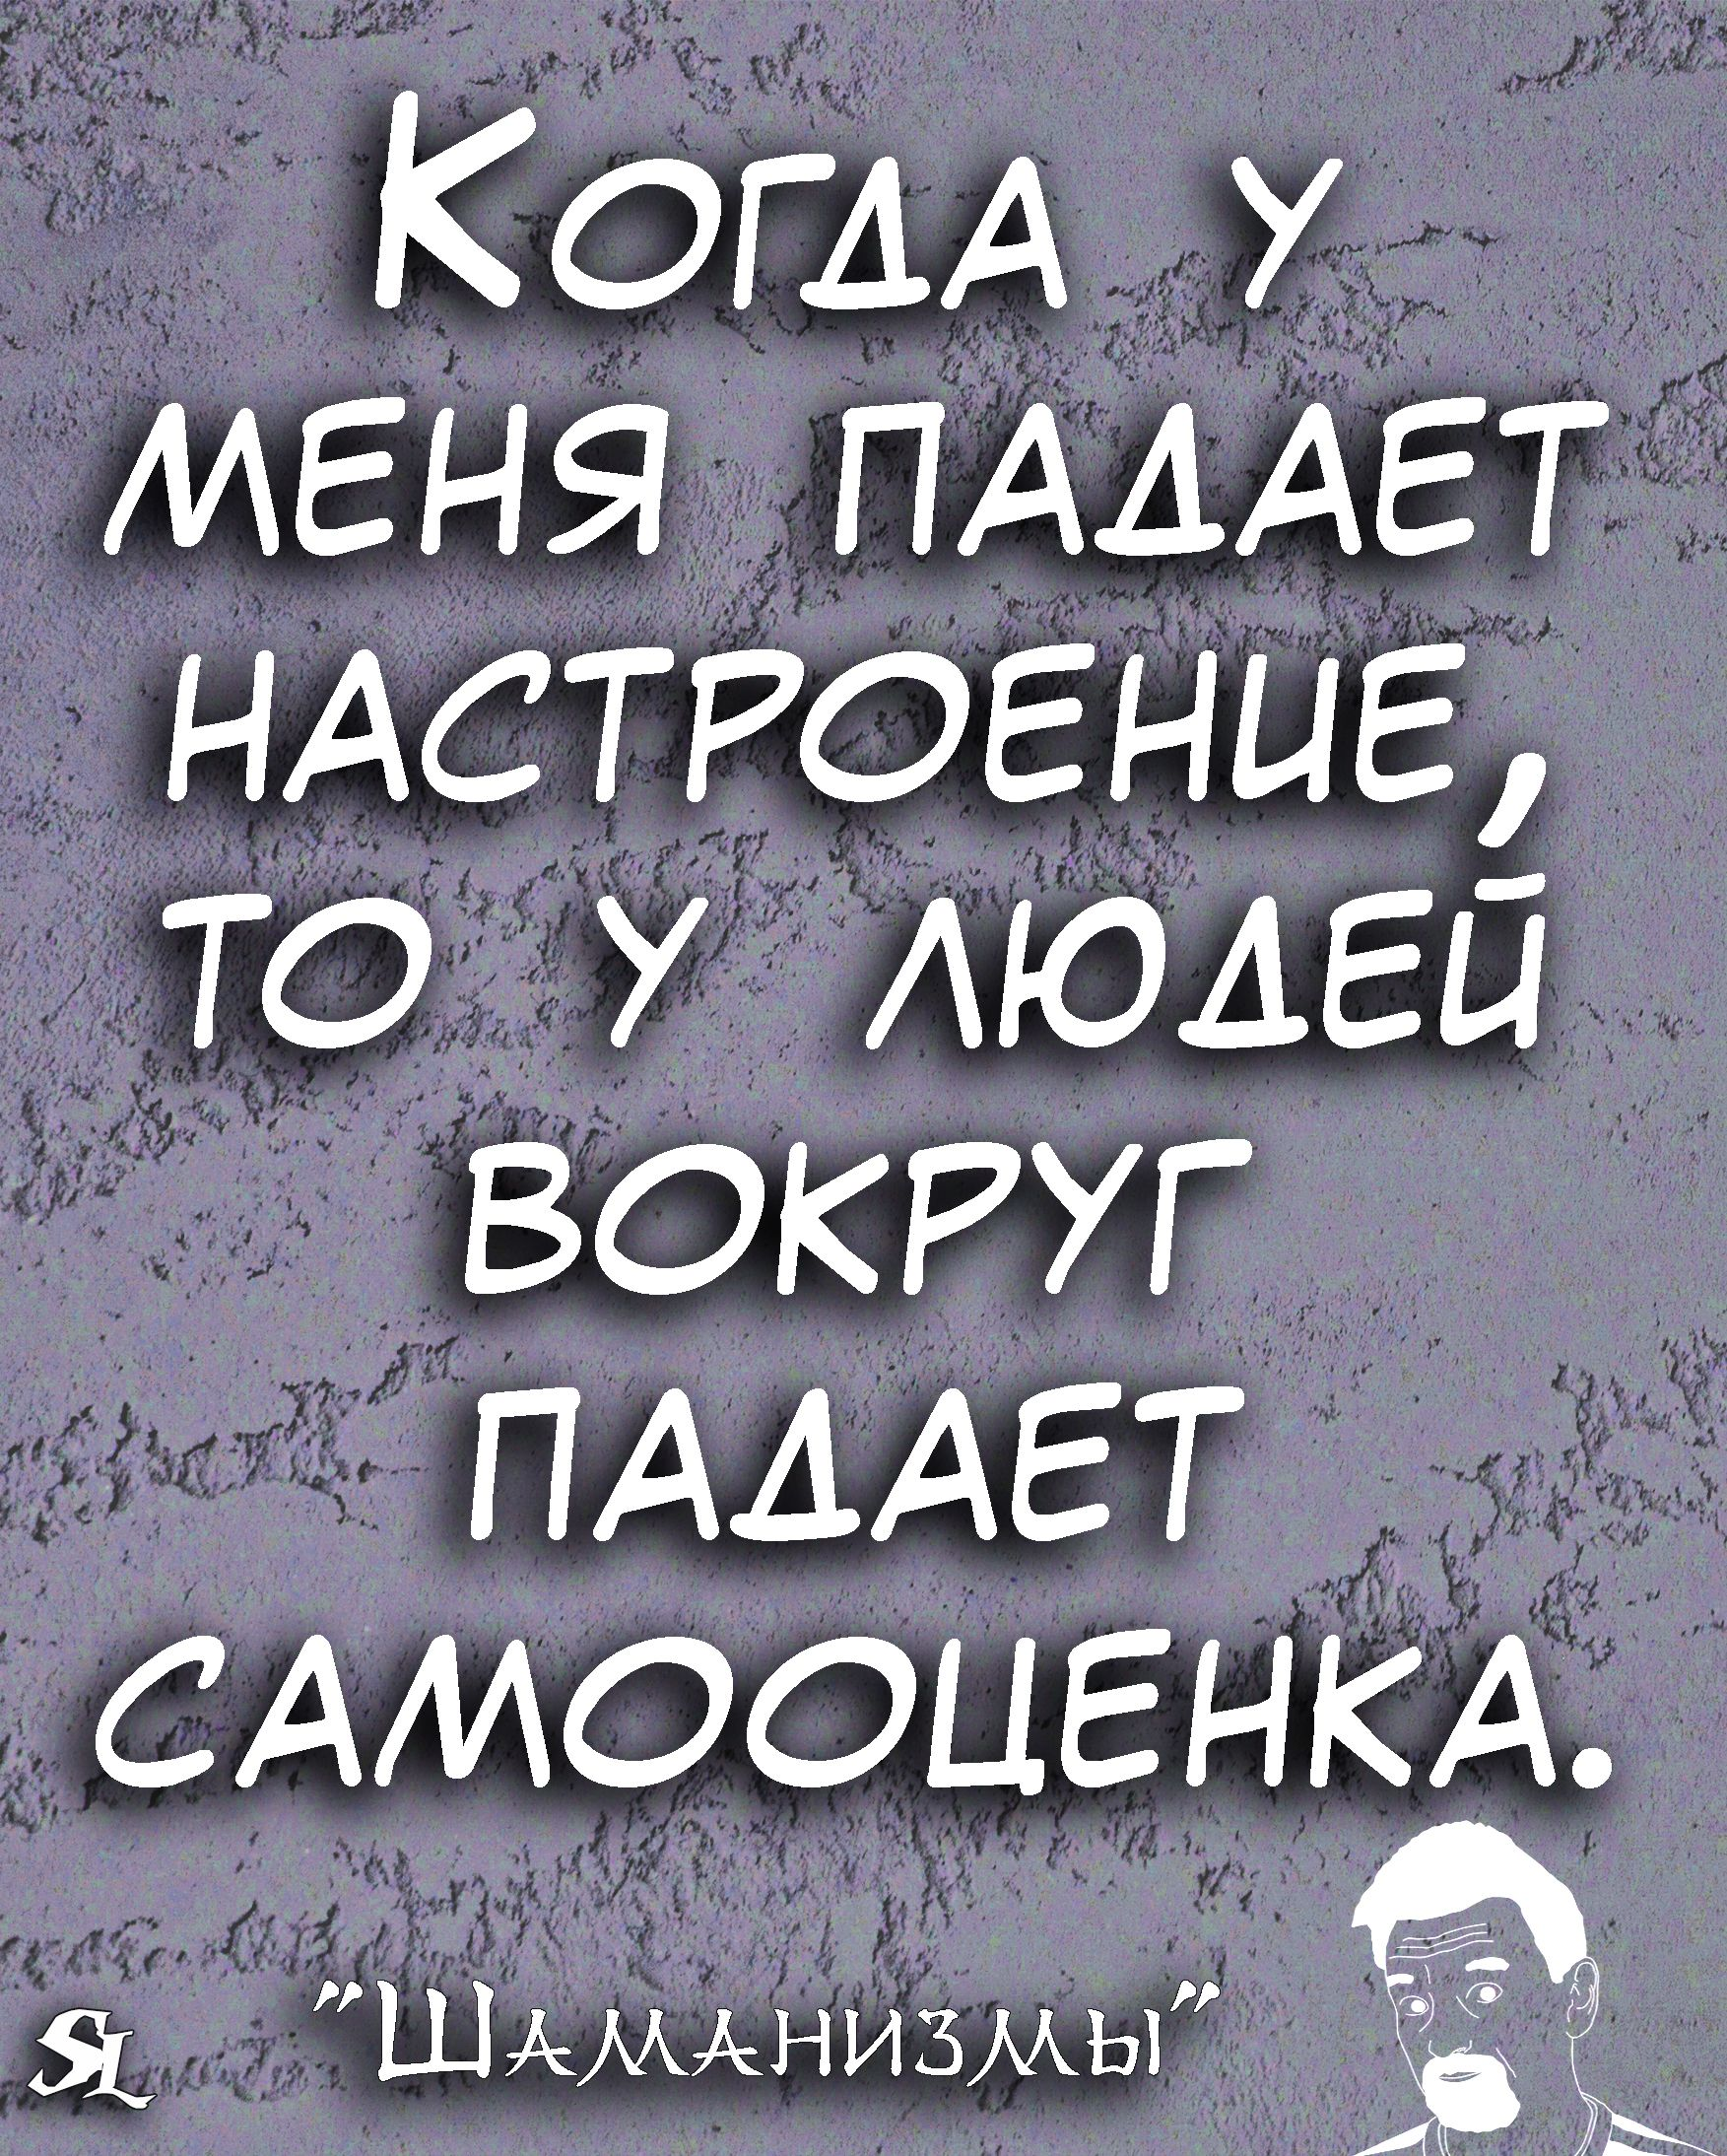 Shamanizmy Shutki Prikol Yumor Jokes Funny Humor Memes In 2021 Quotes Quotations Phrase Of The Day